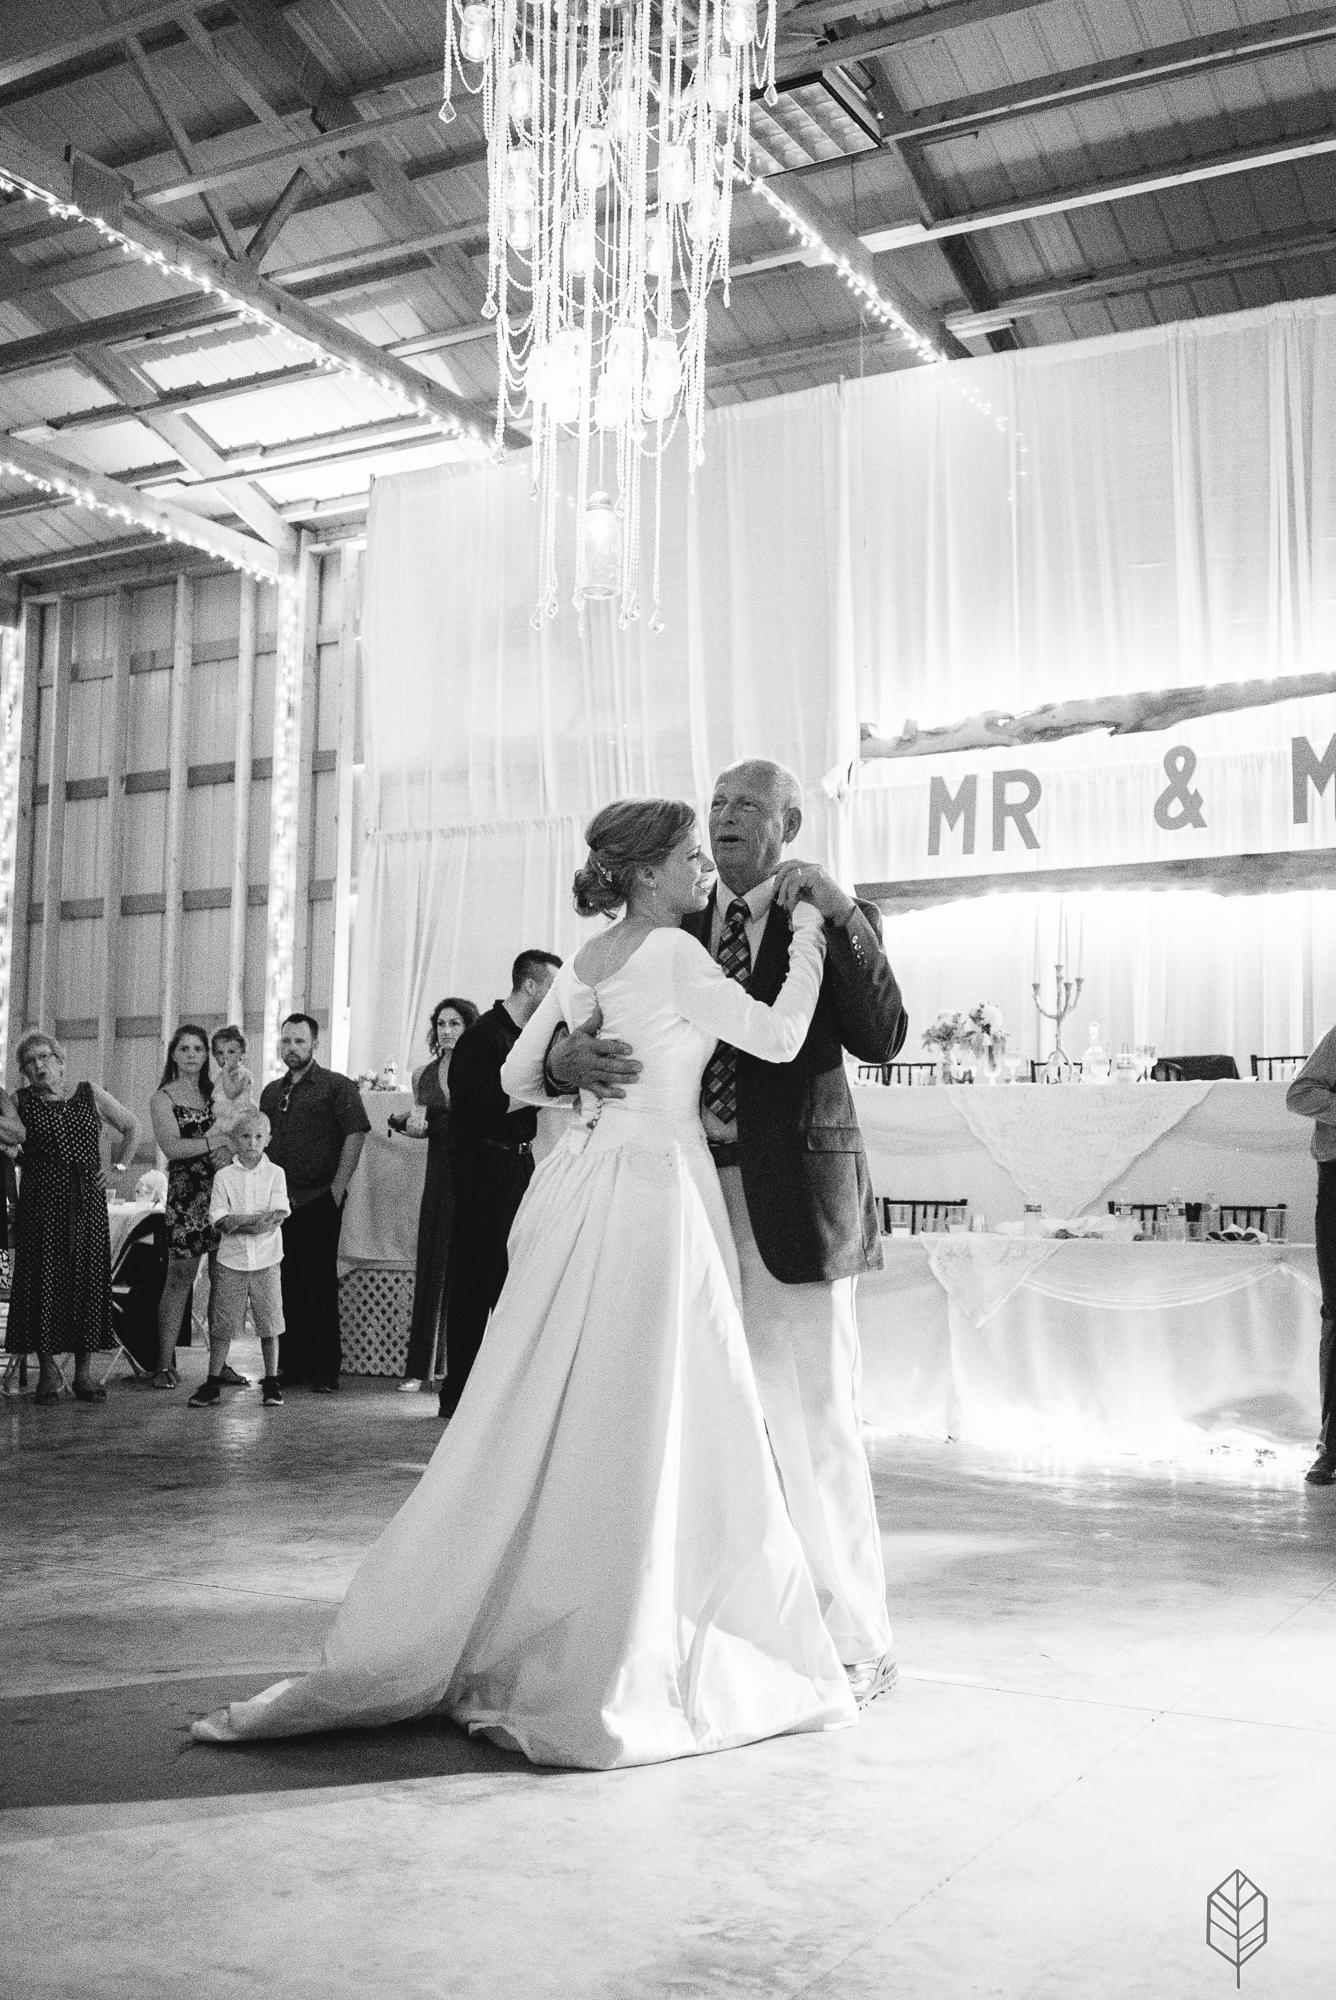 johnsonscreative_Ambrosia_wedding-44.jpg